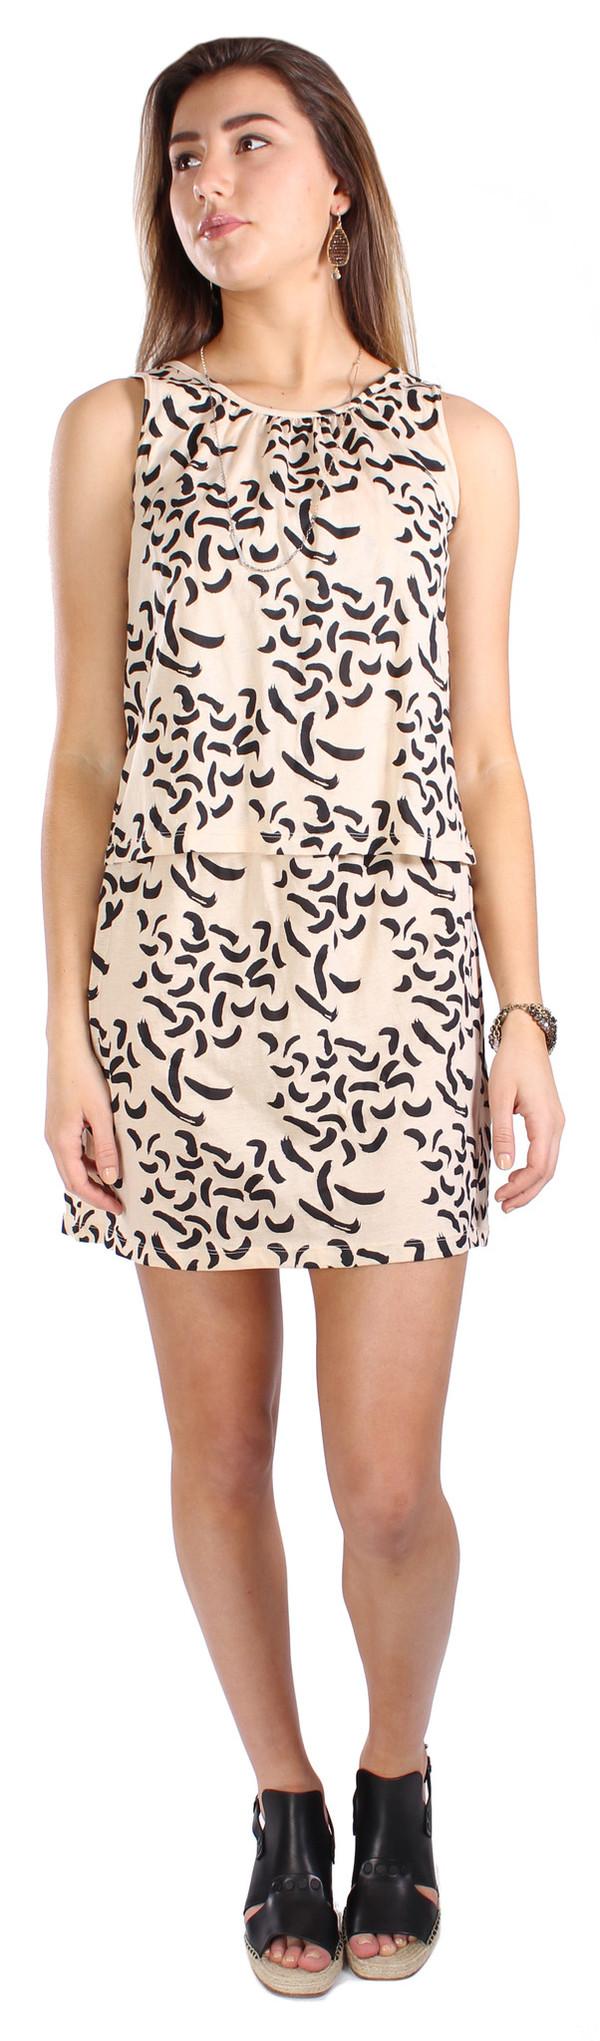 Hoss Intropia Print Dress